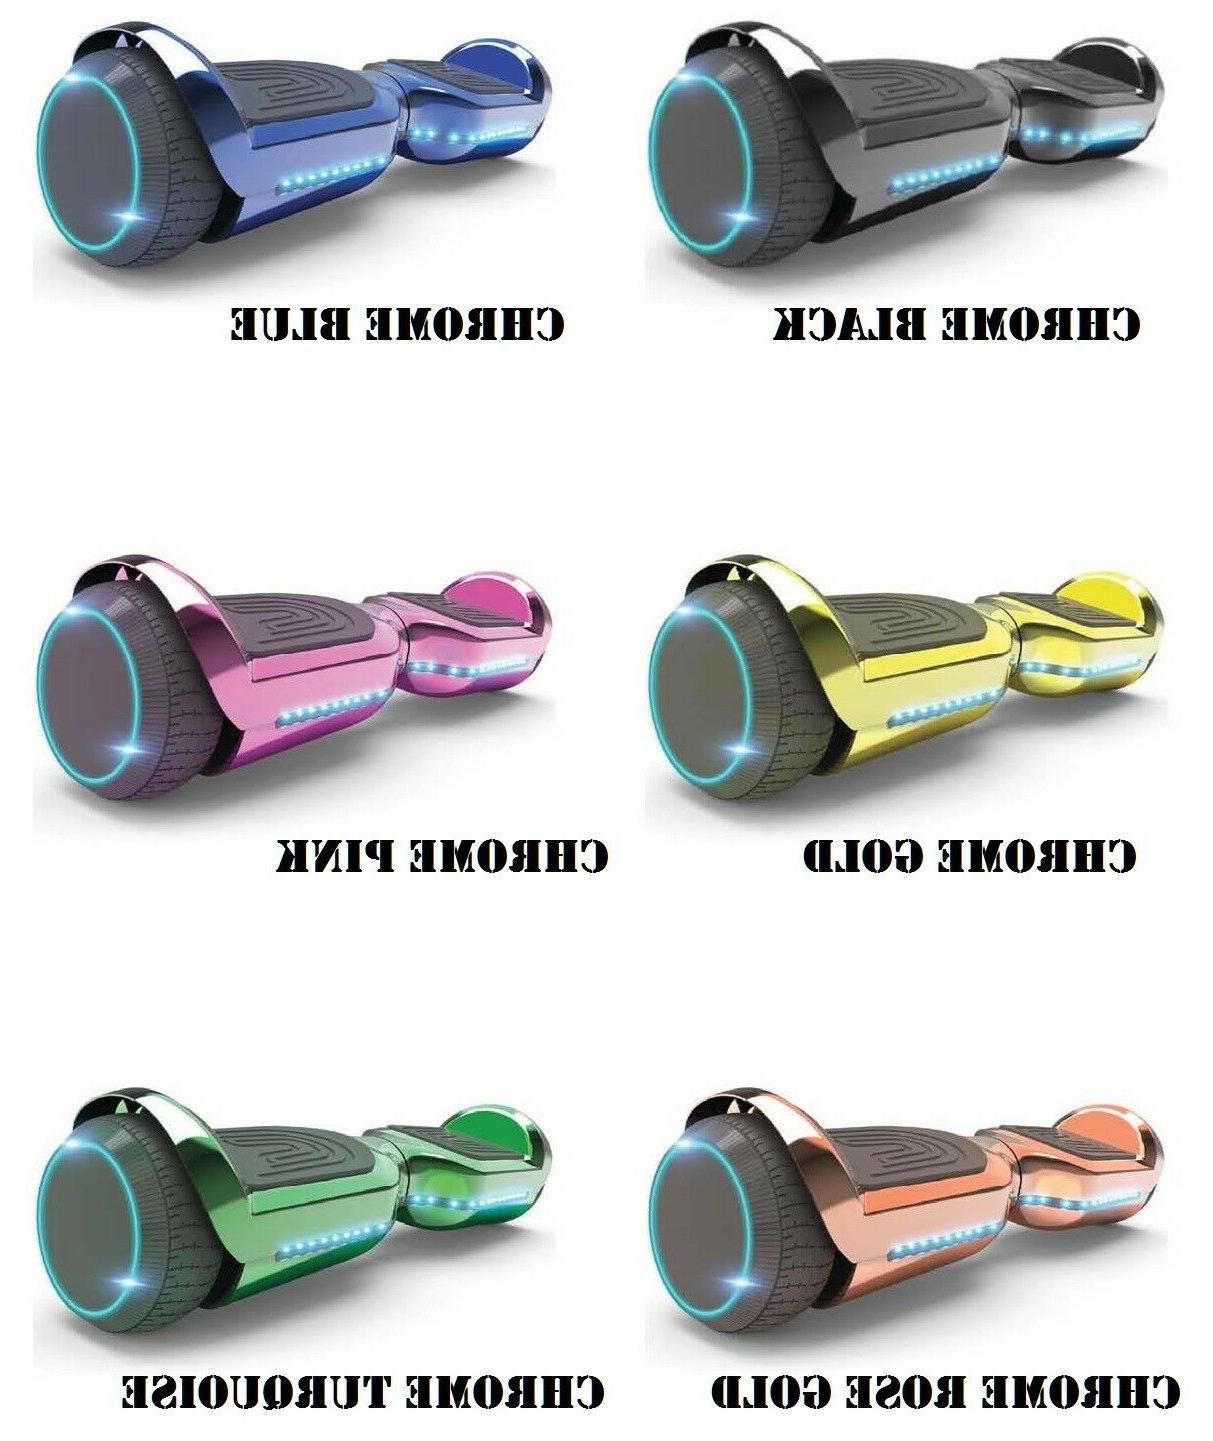 6 5 selfbalancing scooter bluetooth speaker led